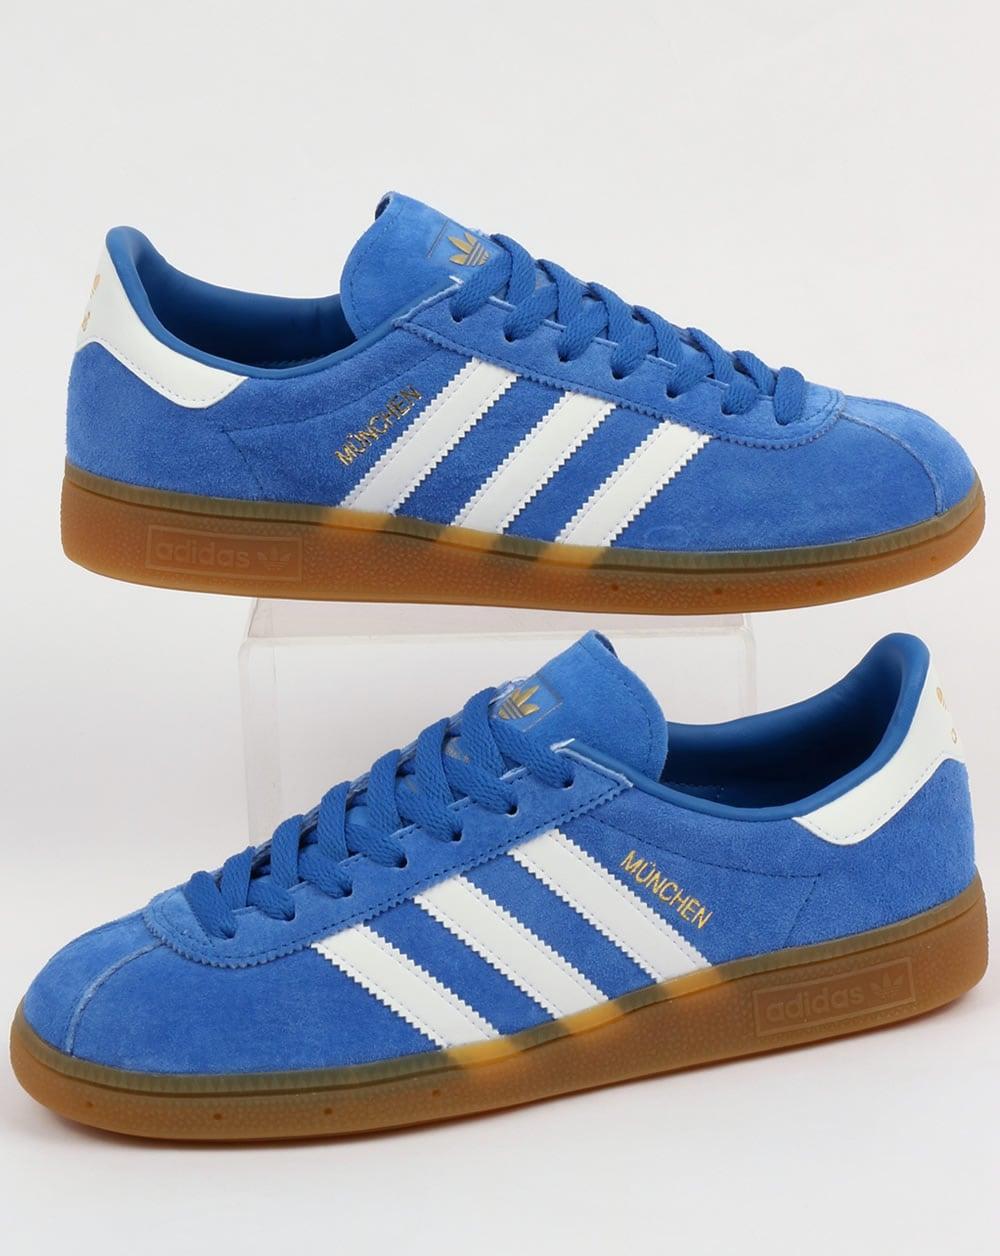 El camarero Noche arrastrar  Adidas Munchen Trainers Blue/White,shoes,originals,mens